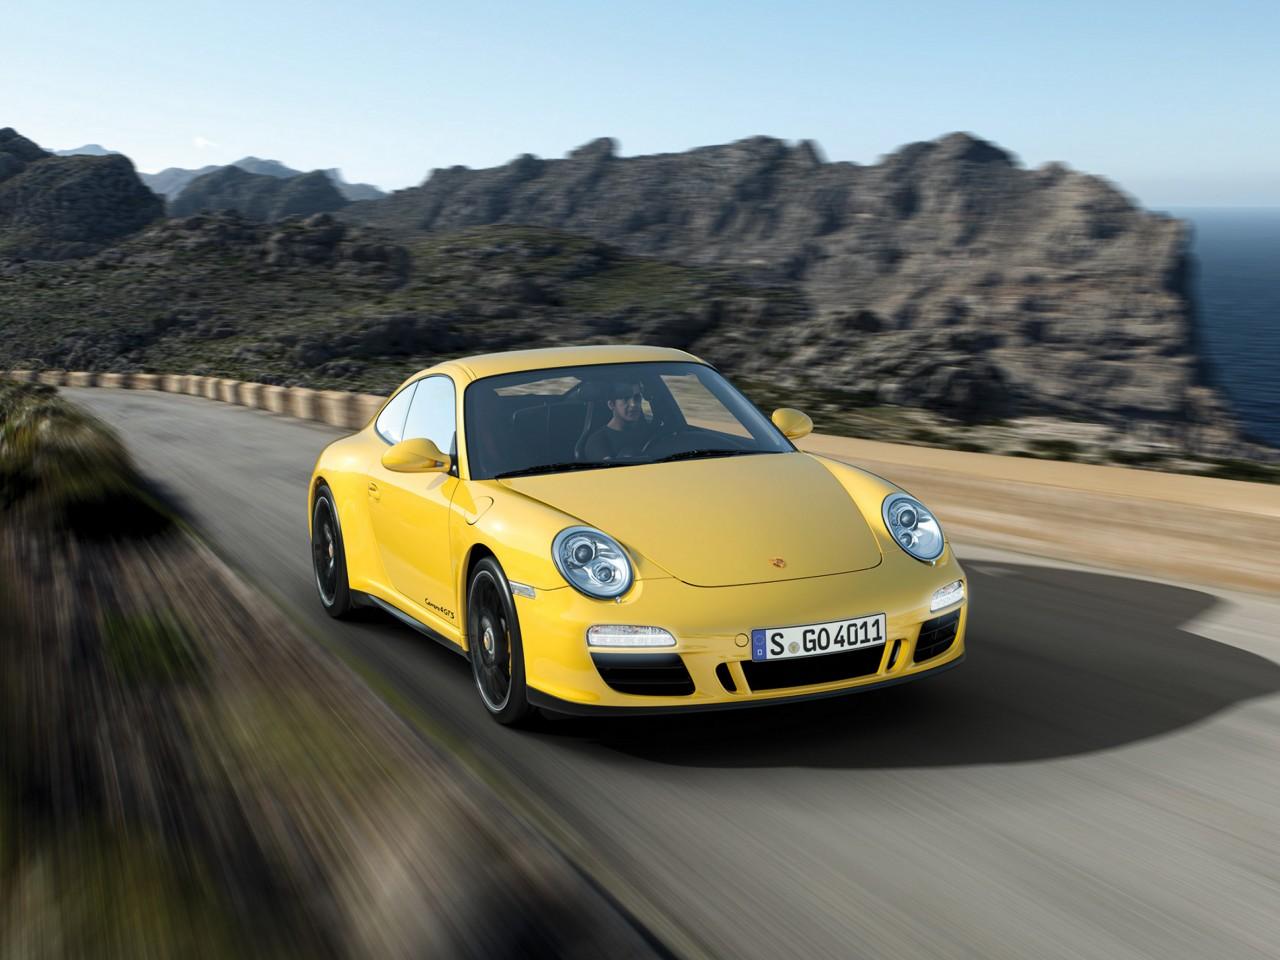 2011 porsche 911 carrera 4 gts motor desktop. Black Bedroom Furniture Sets. Home Design Ideas